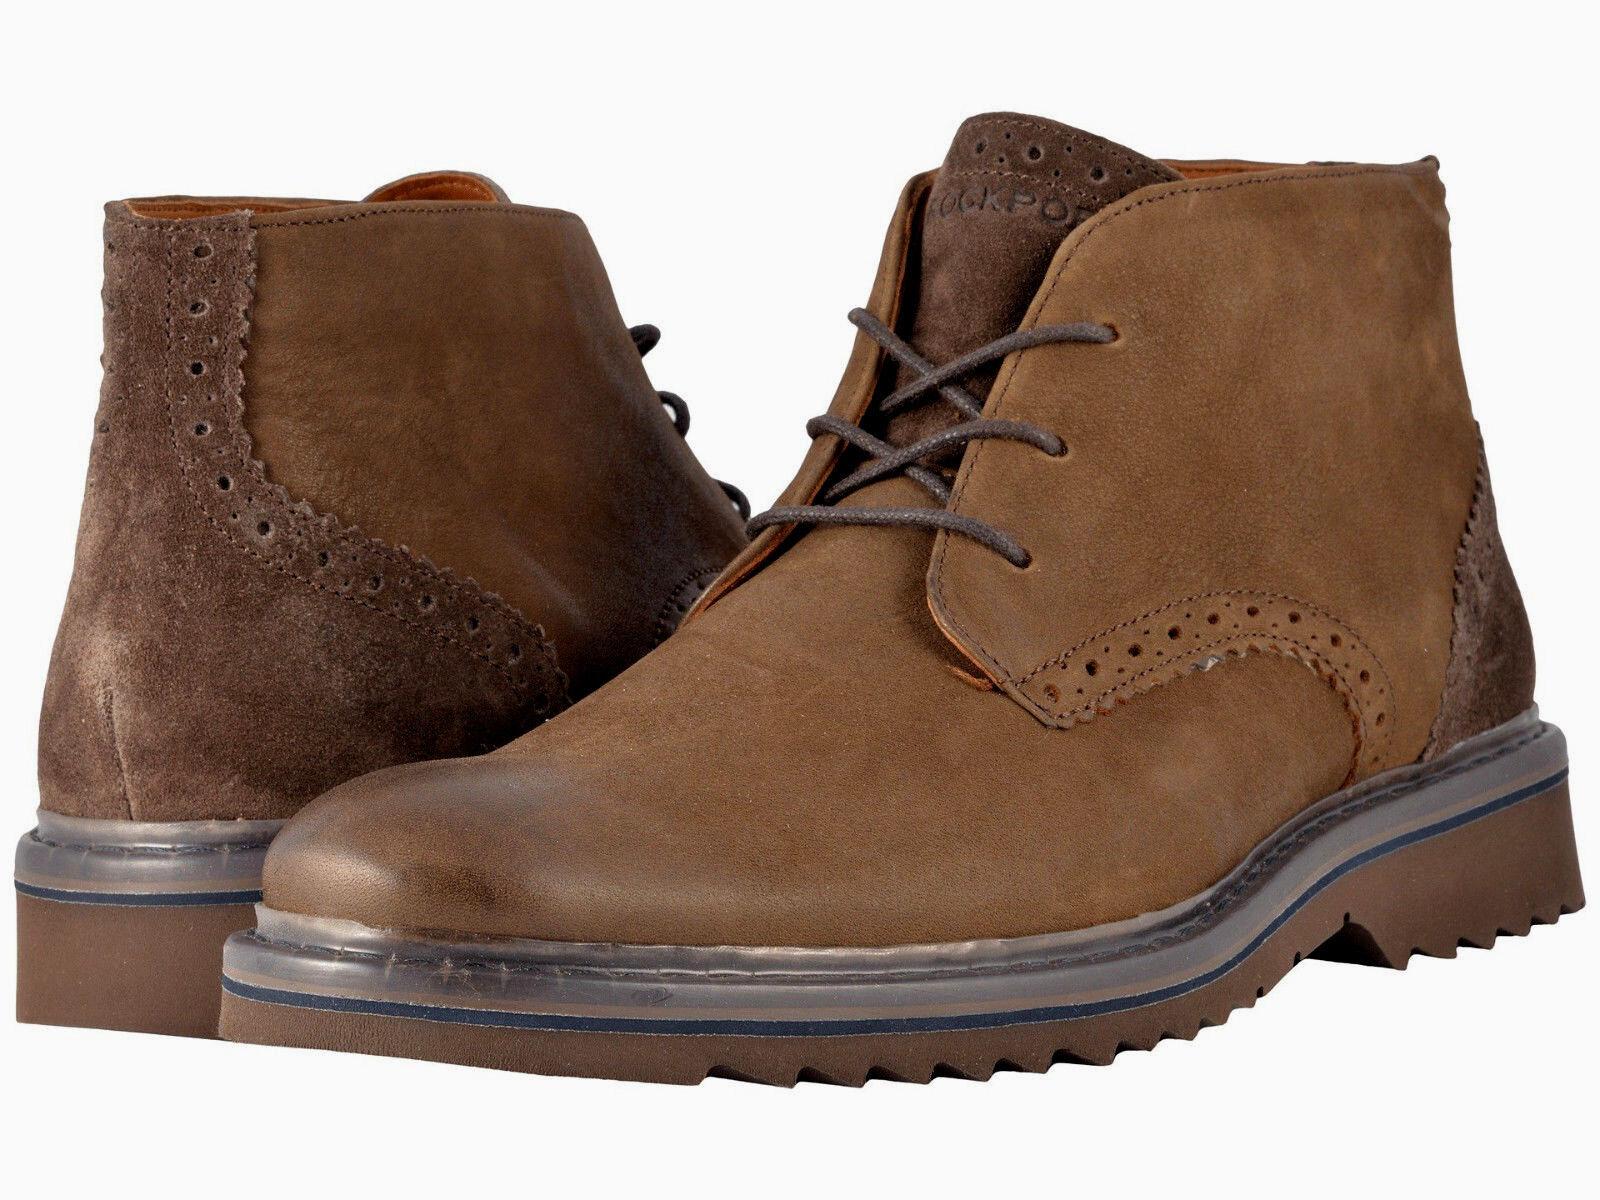 Rockport Men's Jaxson US 11 W Brown Leather Chukka Ankle Boots  160.00